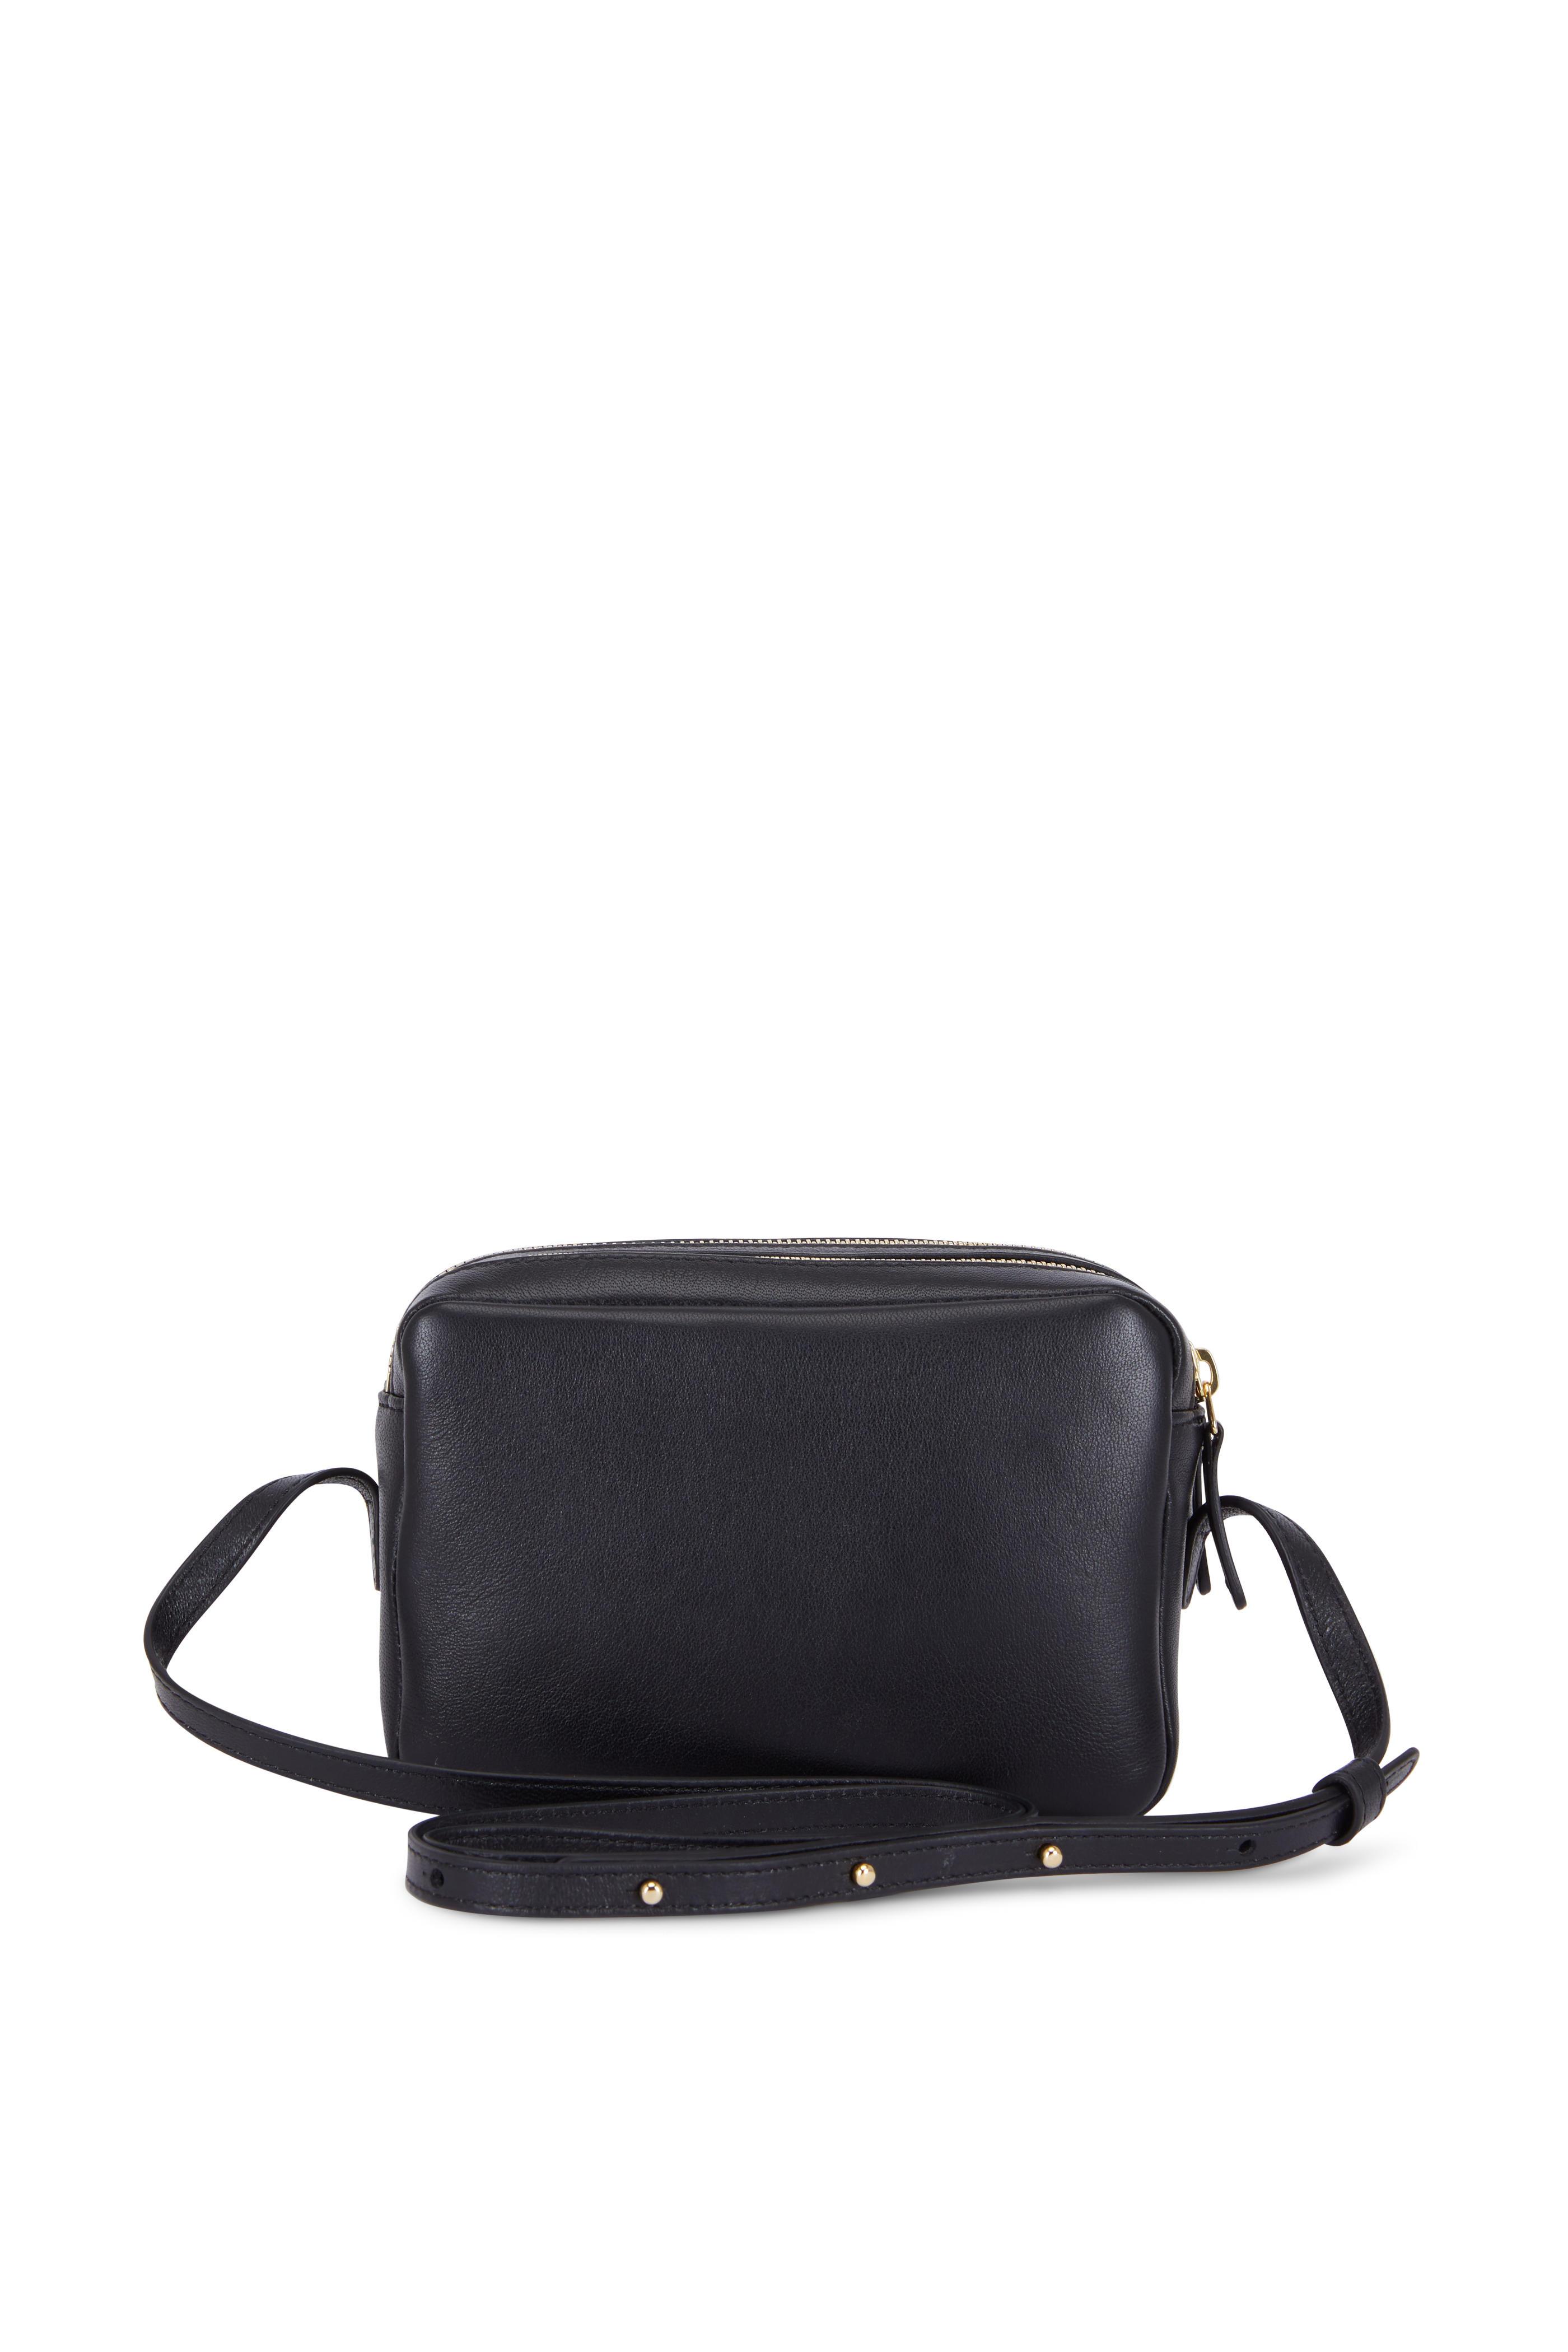 badf4c07a0d3 Mansur Gavriel - Black Leather Double-Zip Crossbody Bag | Mitchell ...